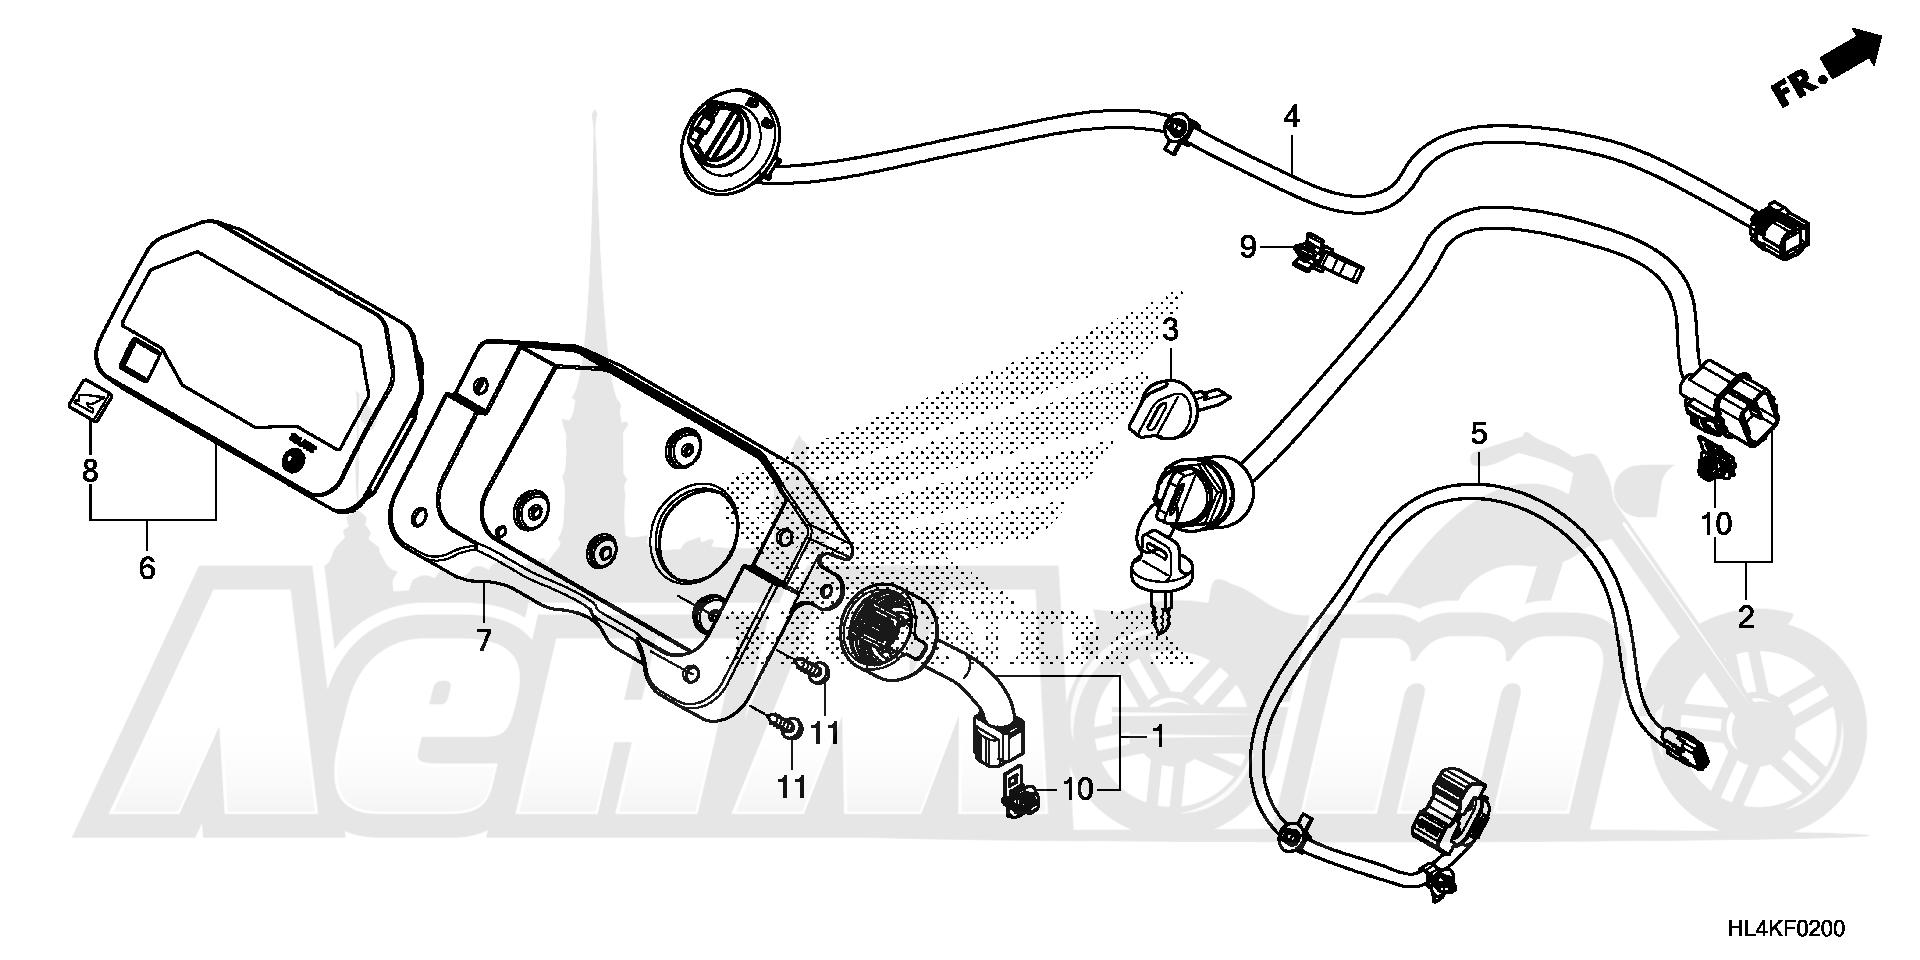 Запчасти для Квадроцикла Honda 2019 SXS1000M3L Раздел: METER AND SWITCH (1) | счетчик и переключатель (1)